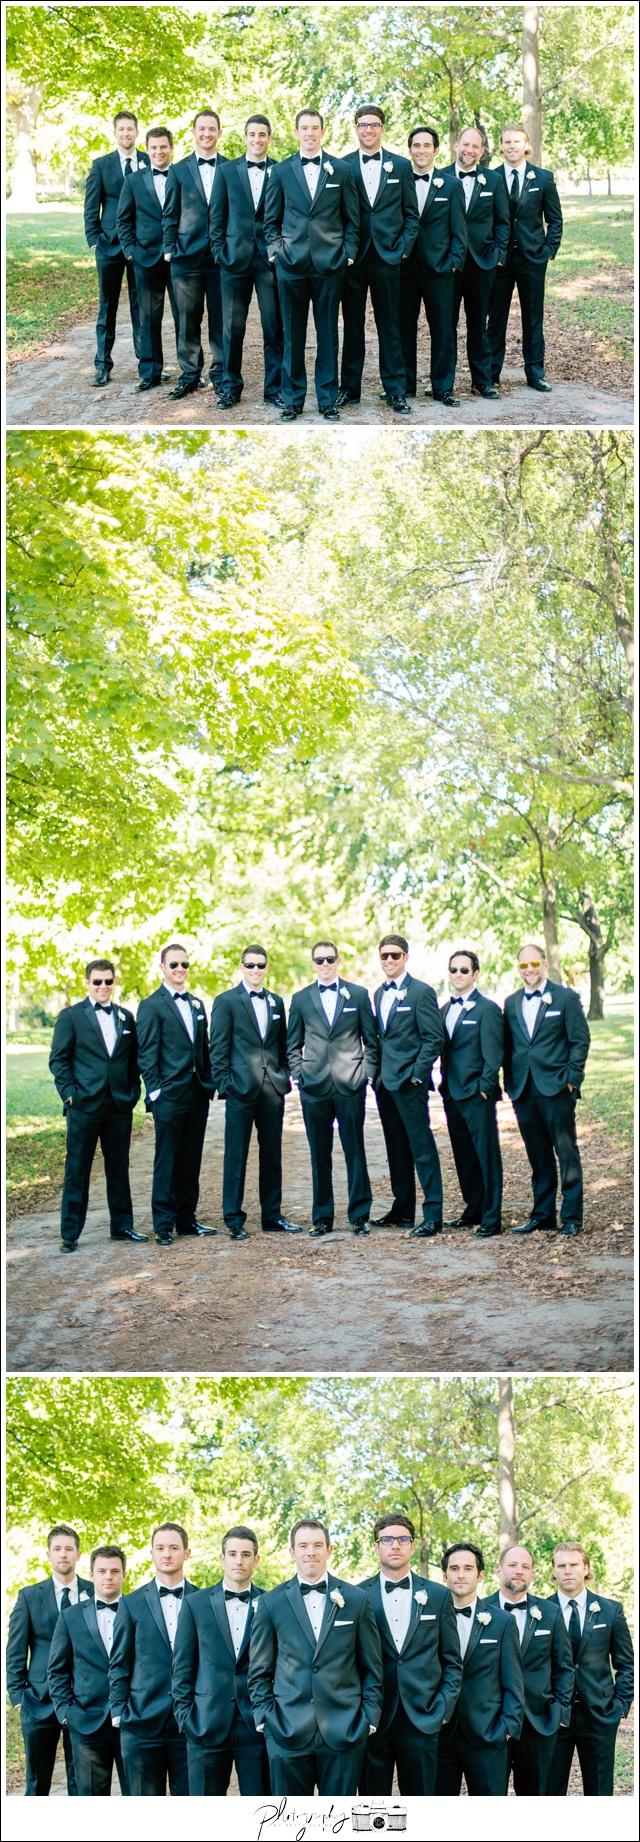 19-Groom-Groomsmen-Black-Michael-Kors-Suits-Seattle-Wedding-Photographer-Photography-by-Betty-Elaine